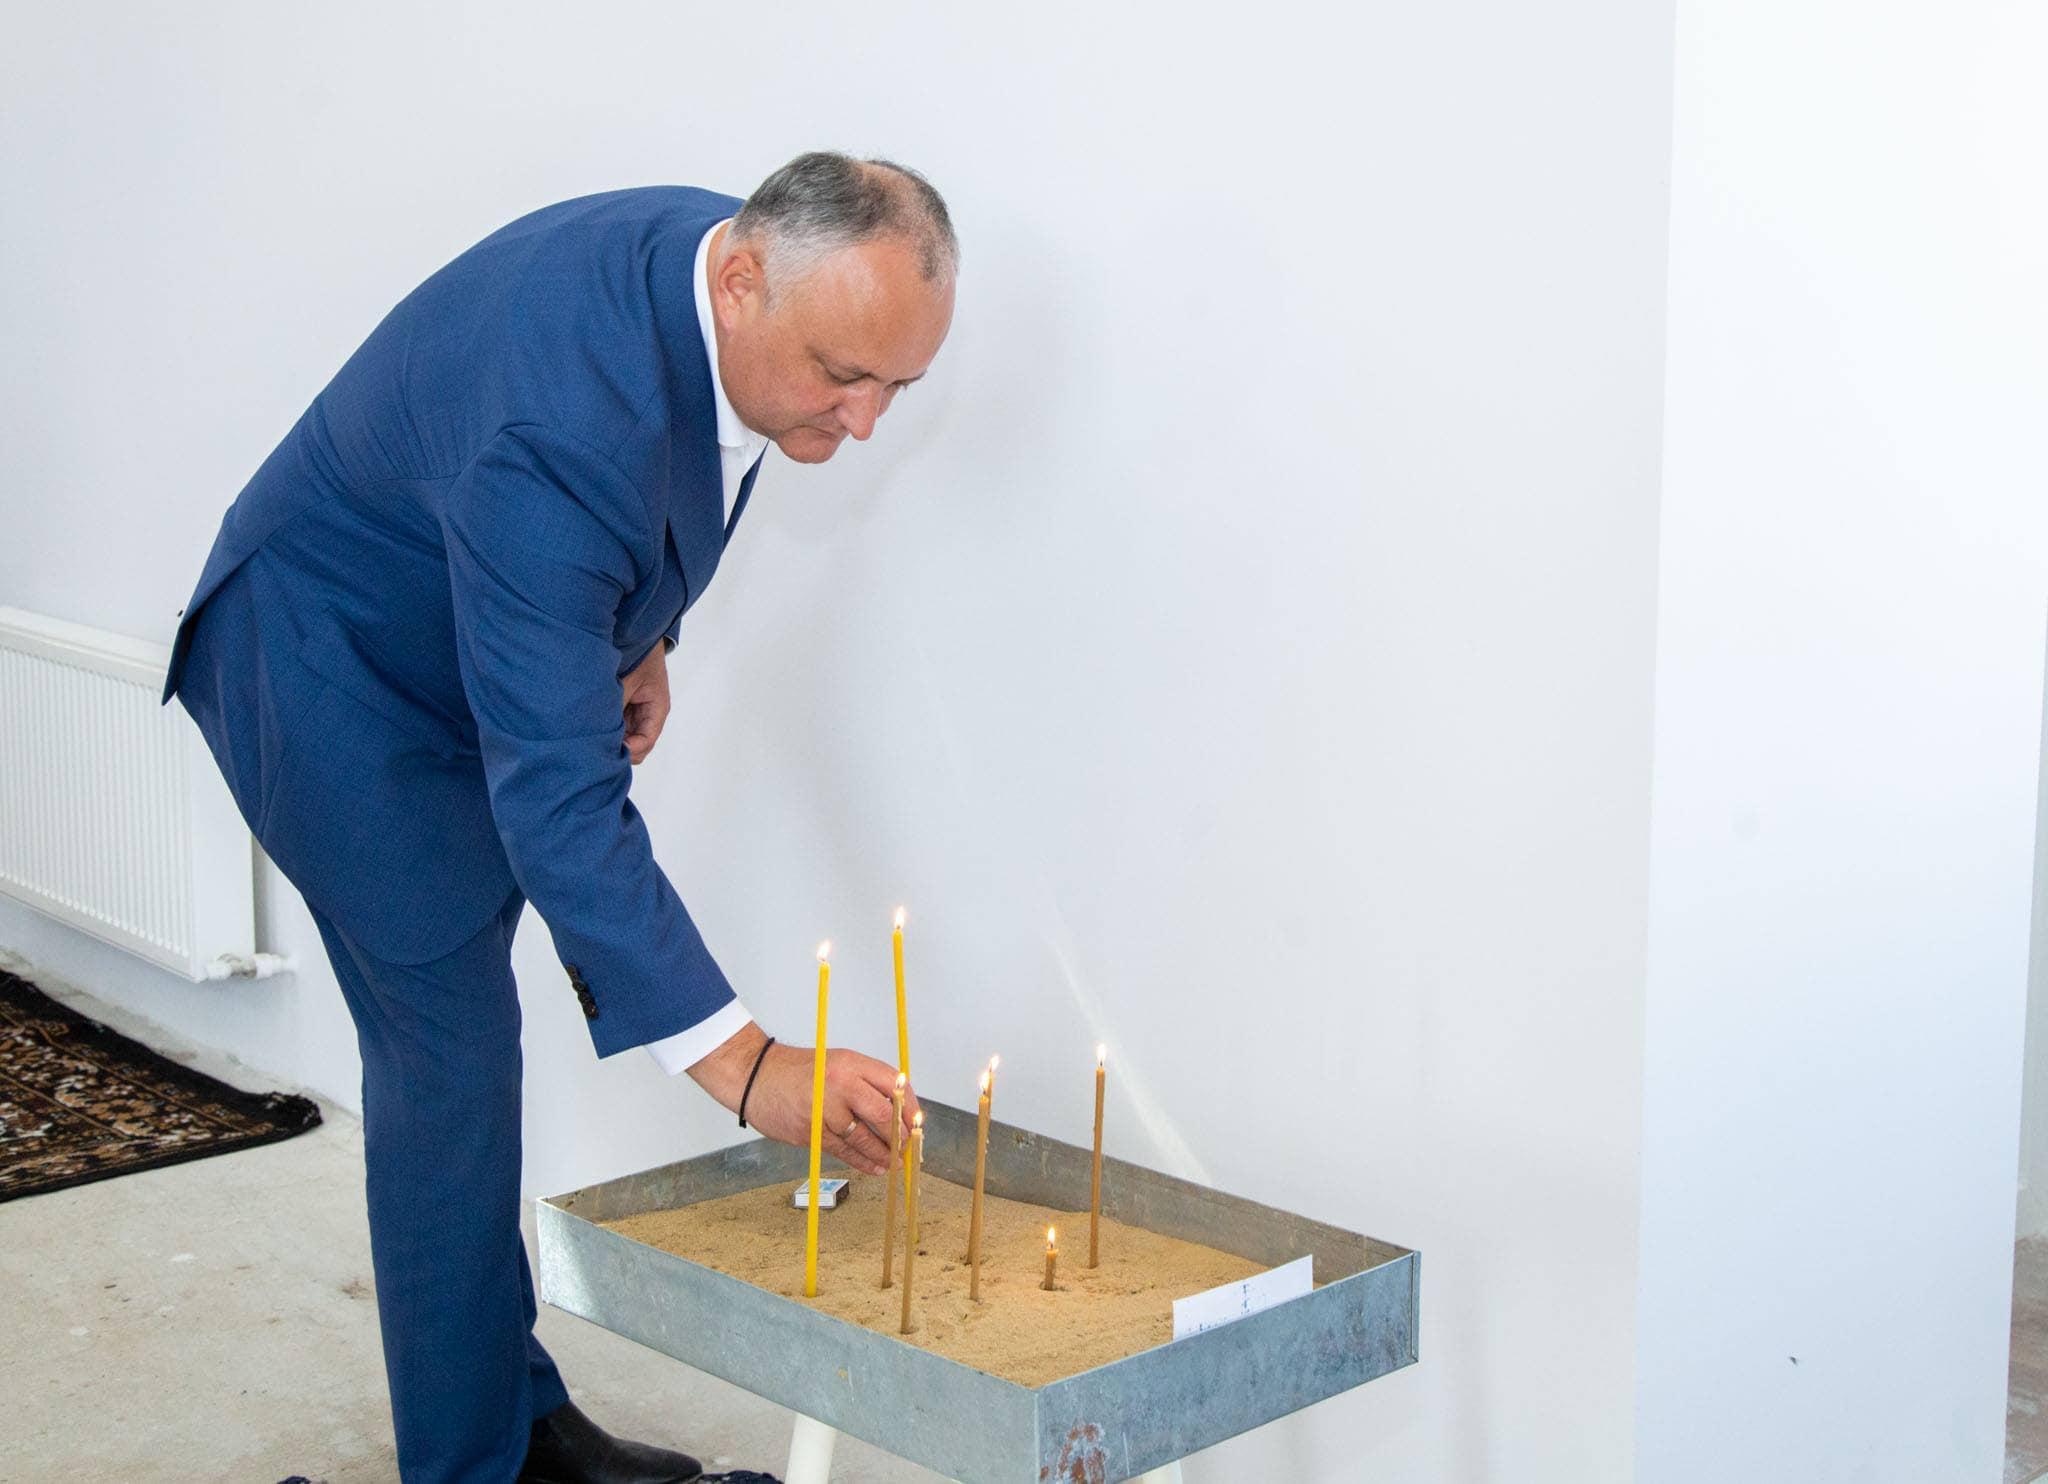 Президент помолился за мир в нашей стране и благополучие народа (ФОТО, ВИДЕО)